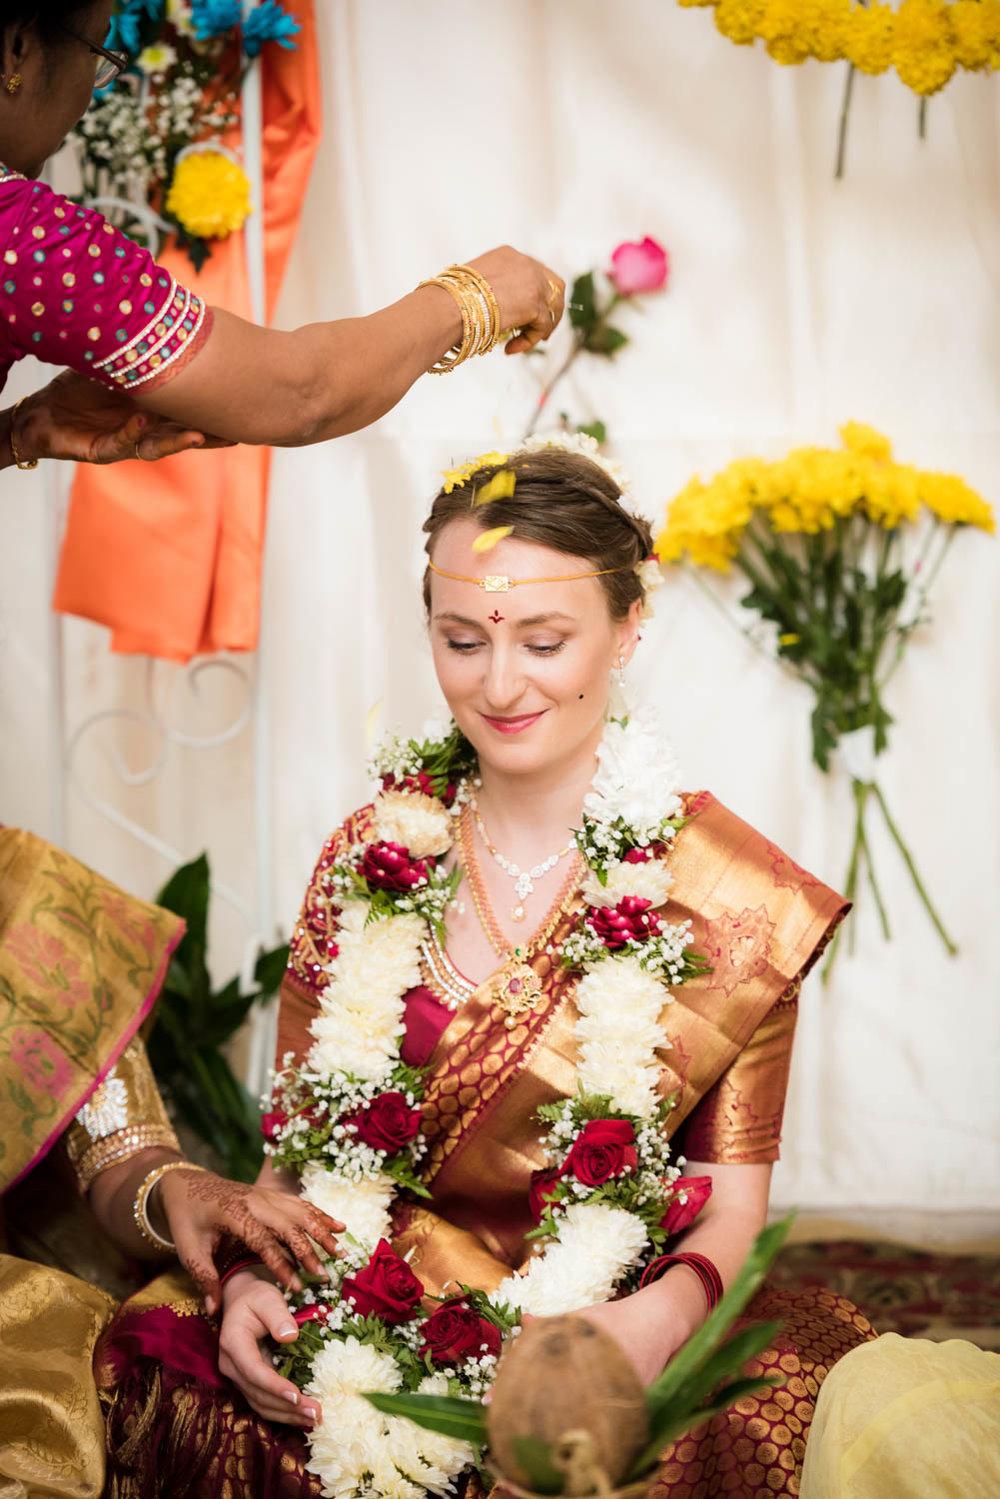 ecaterina-chandu-indian-wedding12.jpg